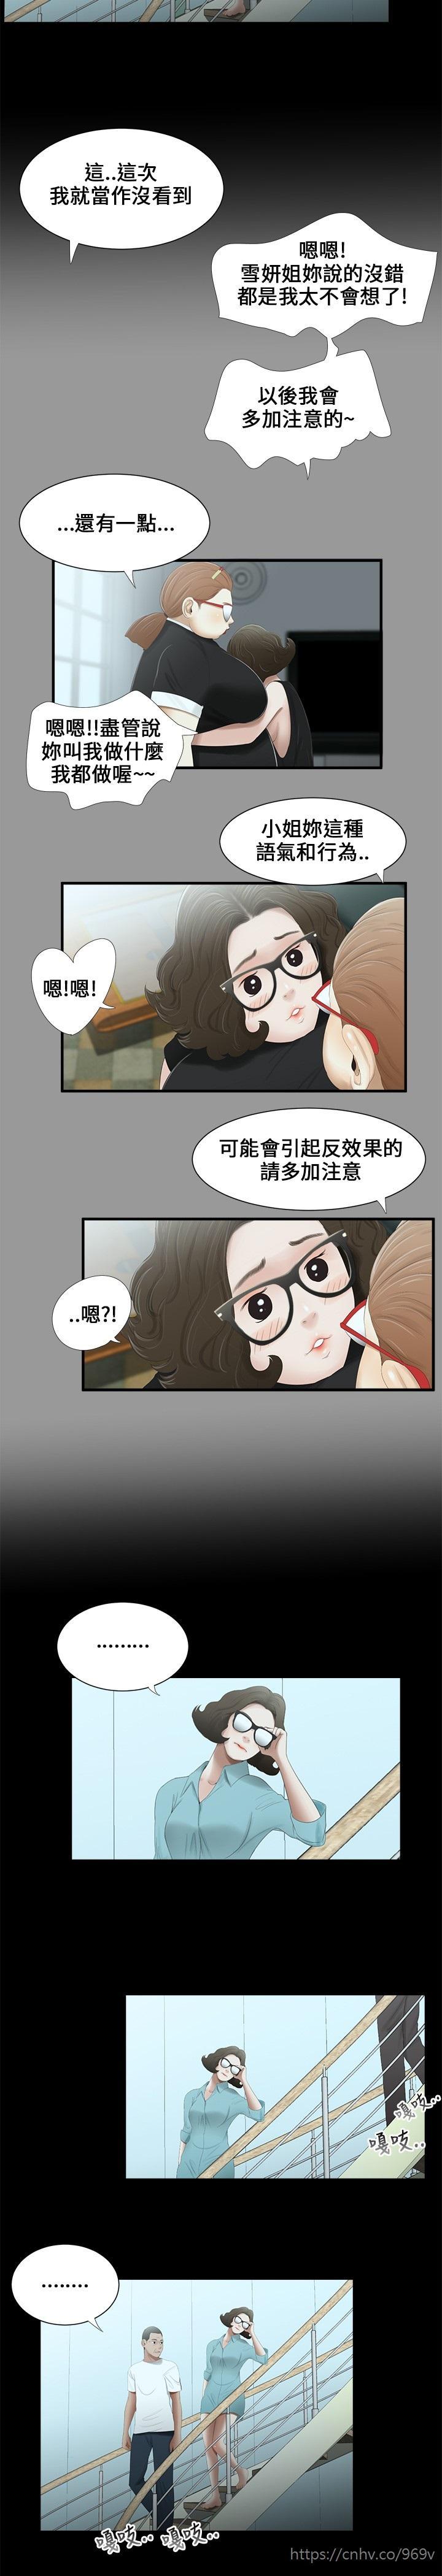 Three sisters 三姐妹Ch.13~19 (Chinese)中文 50